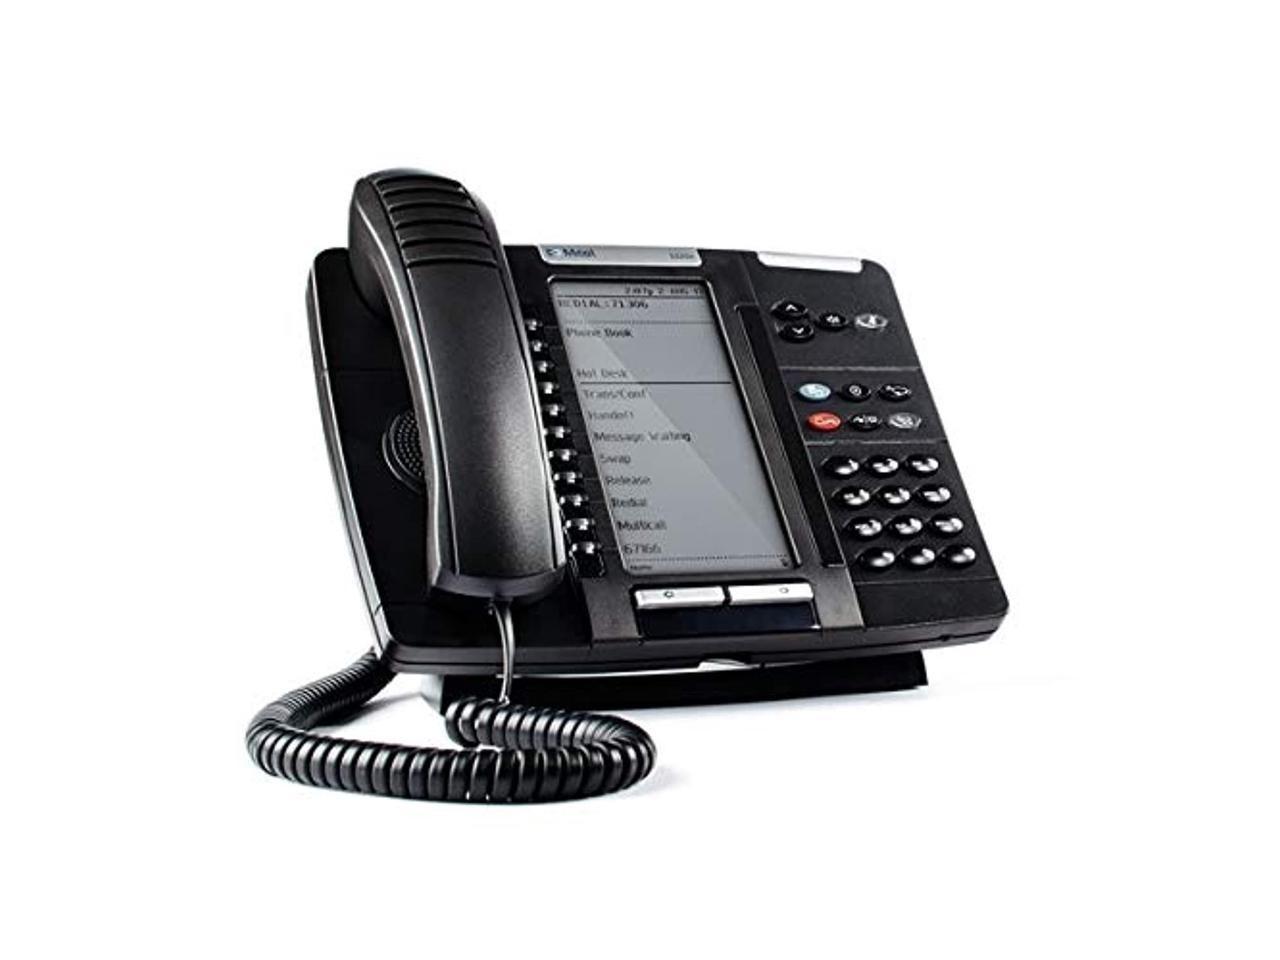 Mitel 5320e VoIP Phone (No Power Supply) 50006634